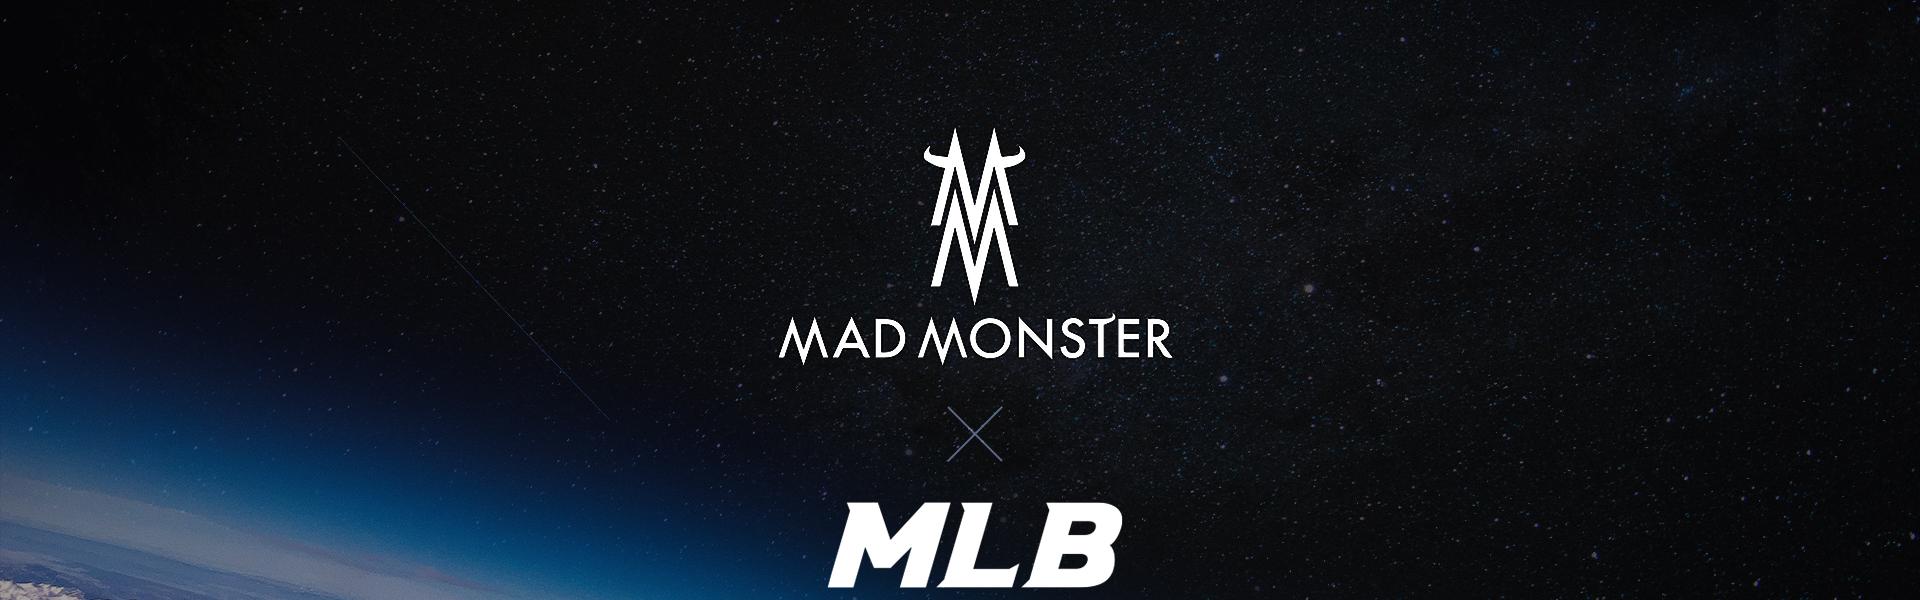 MAD MONSTER X MLB